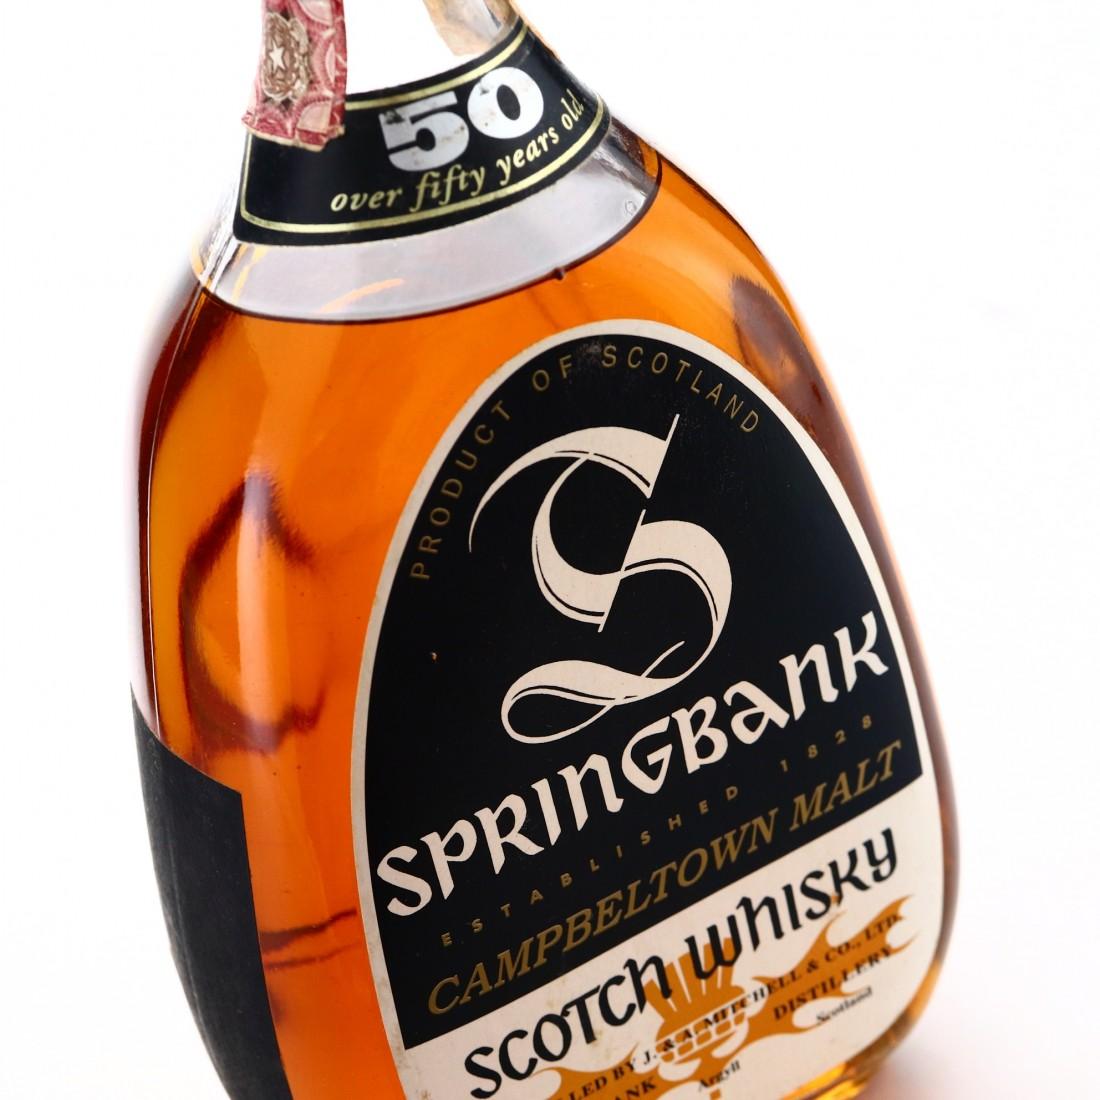 Springbank 1919 50 Year Old